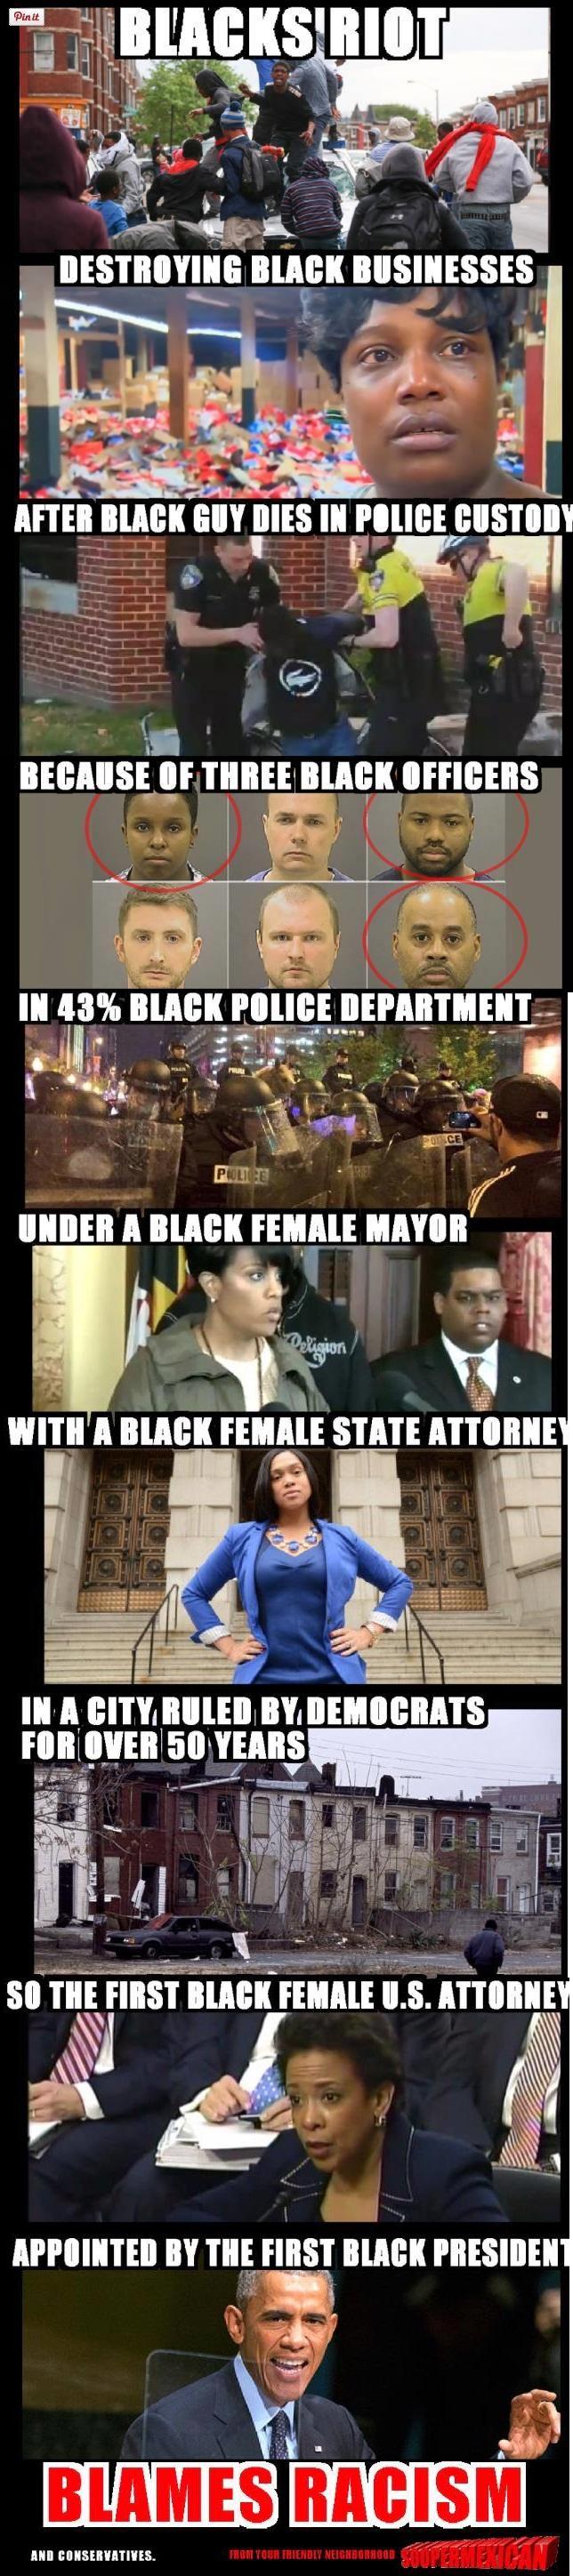 Baltimore in a nutshell.jpg